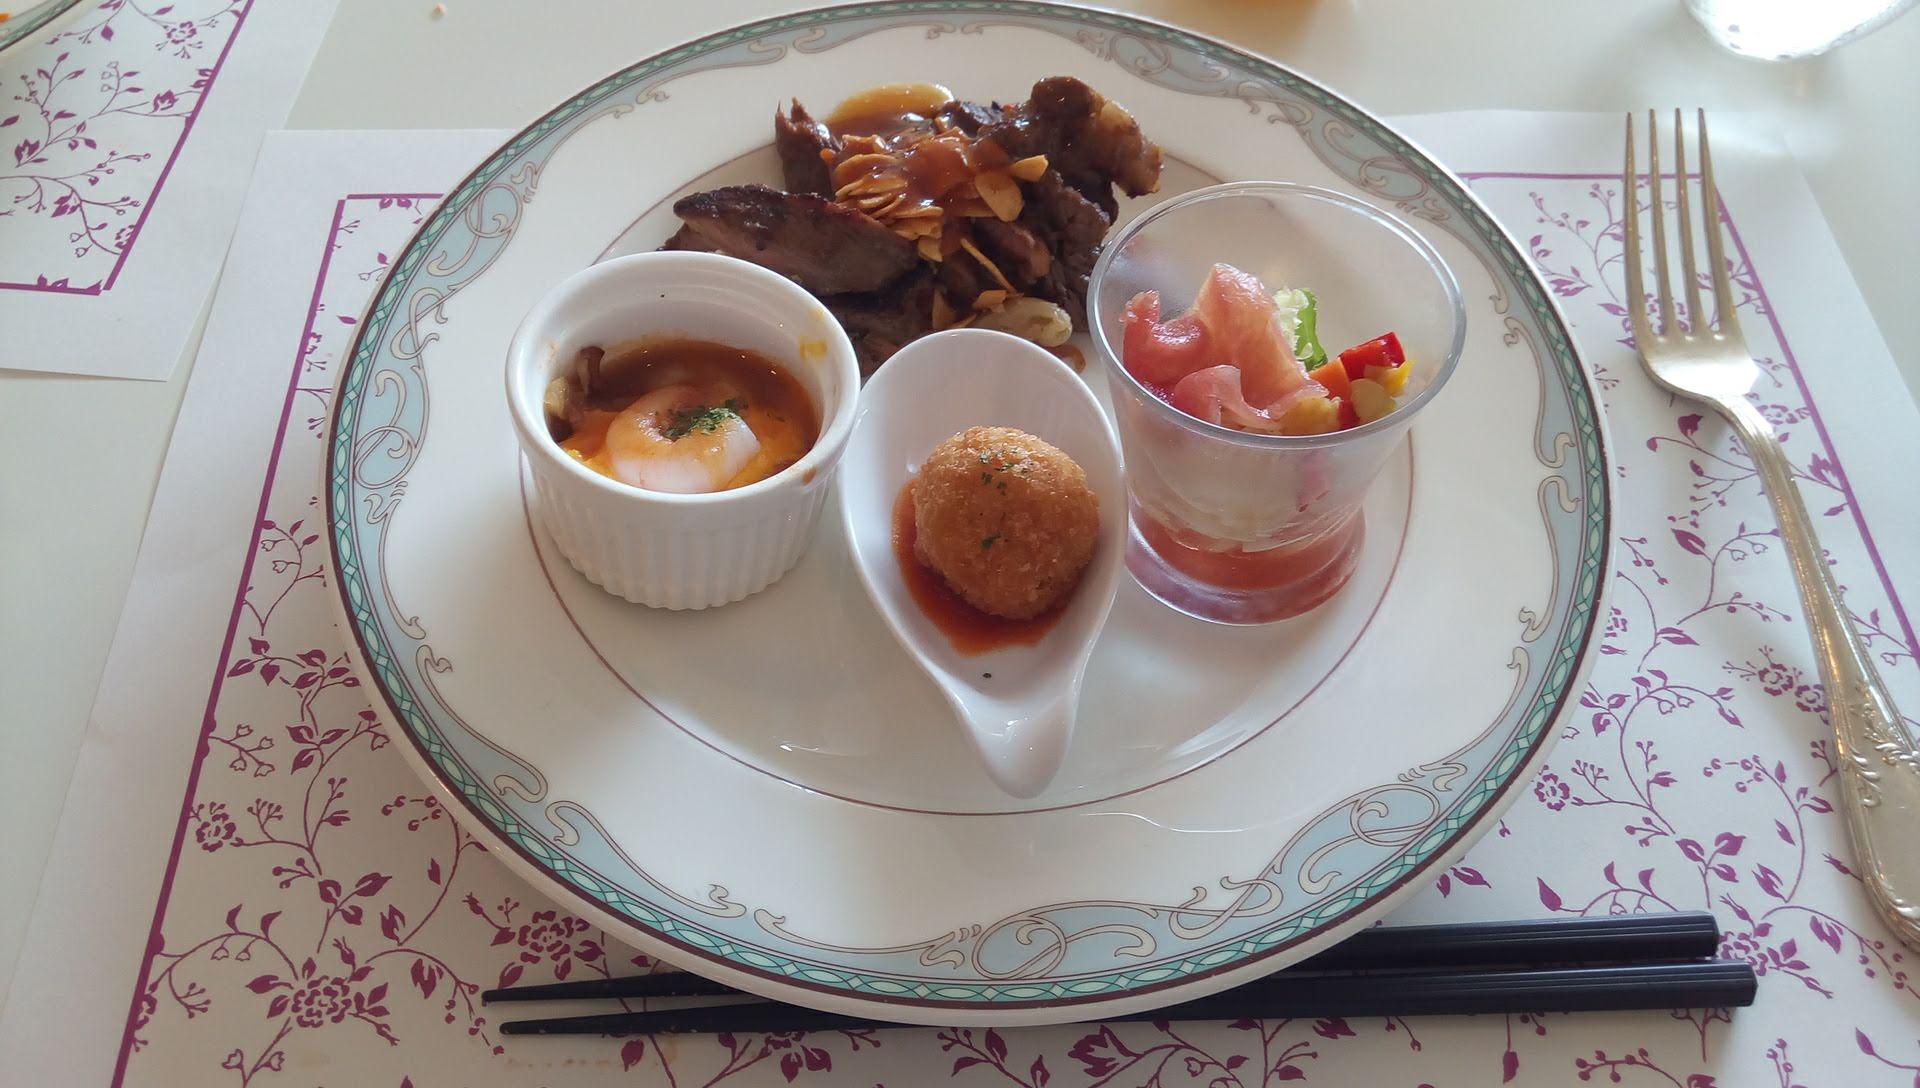 4th dish